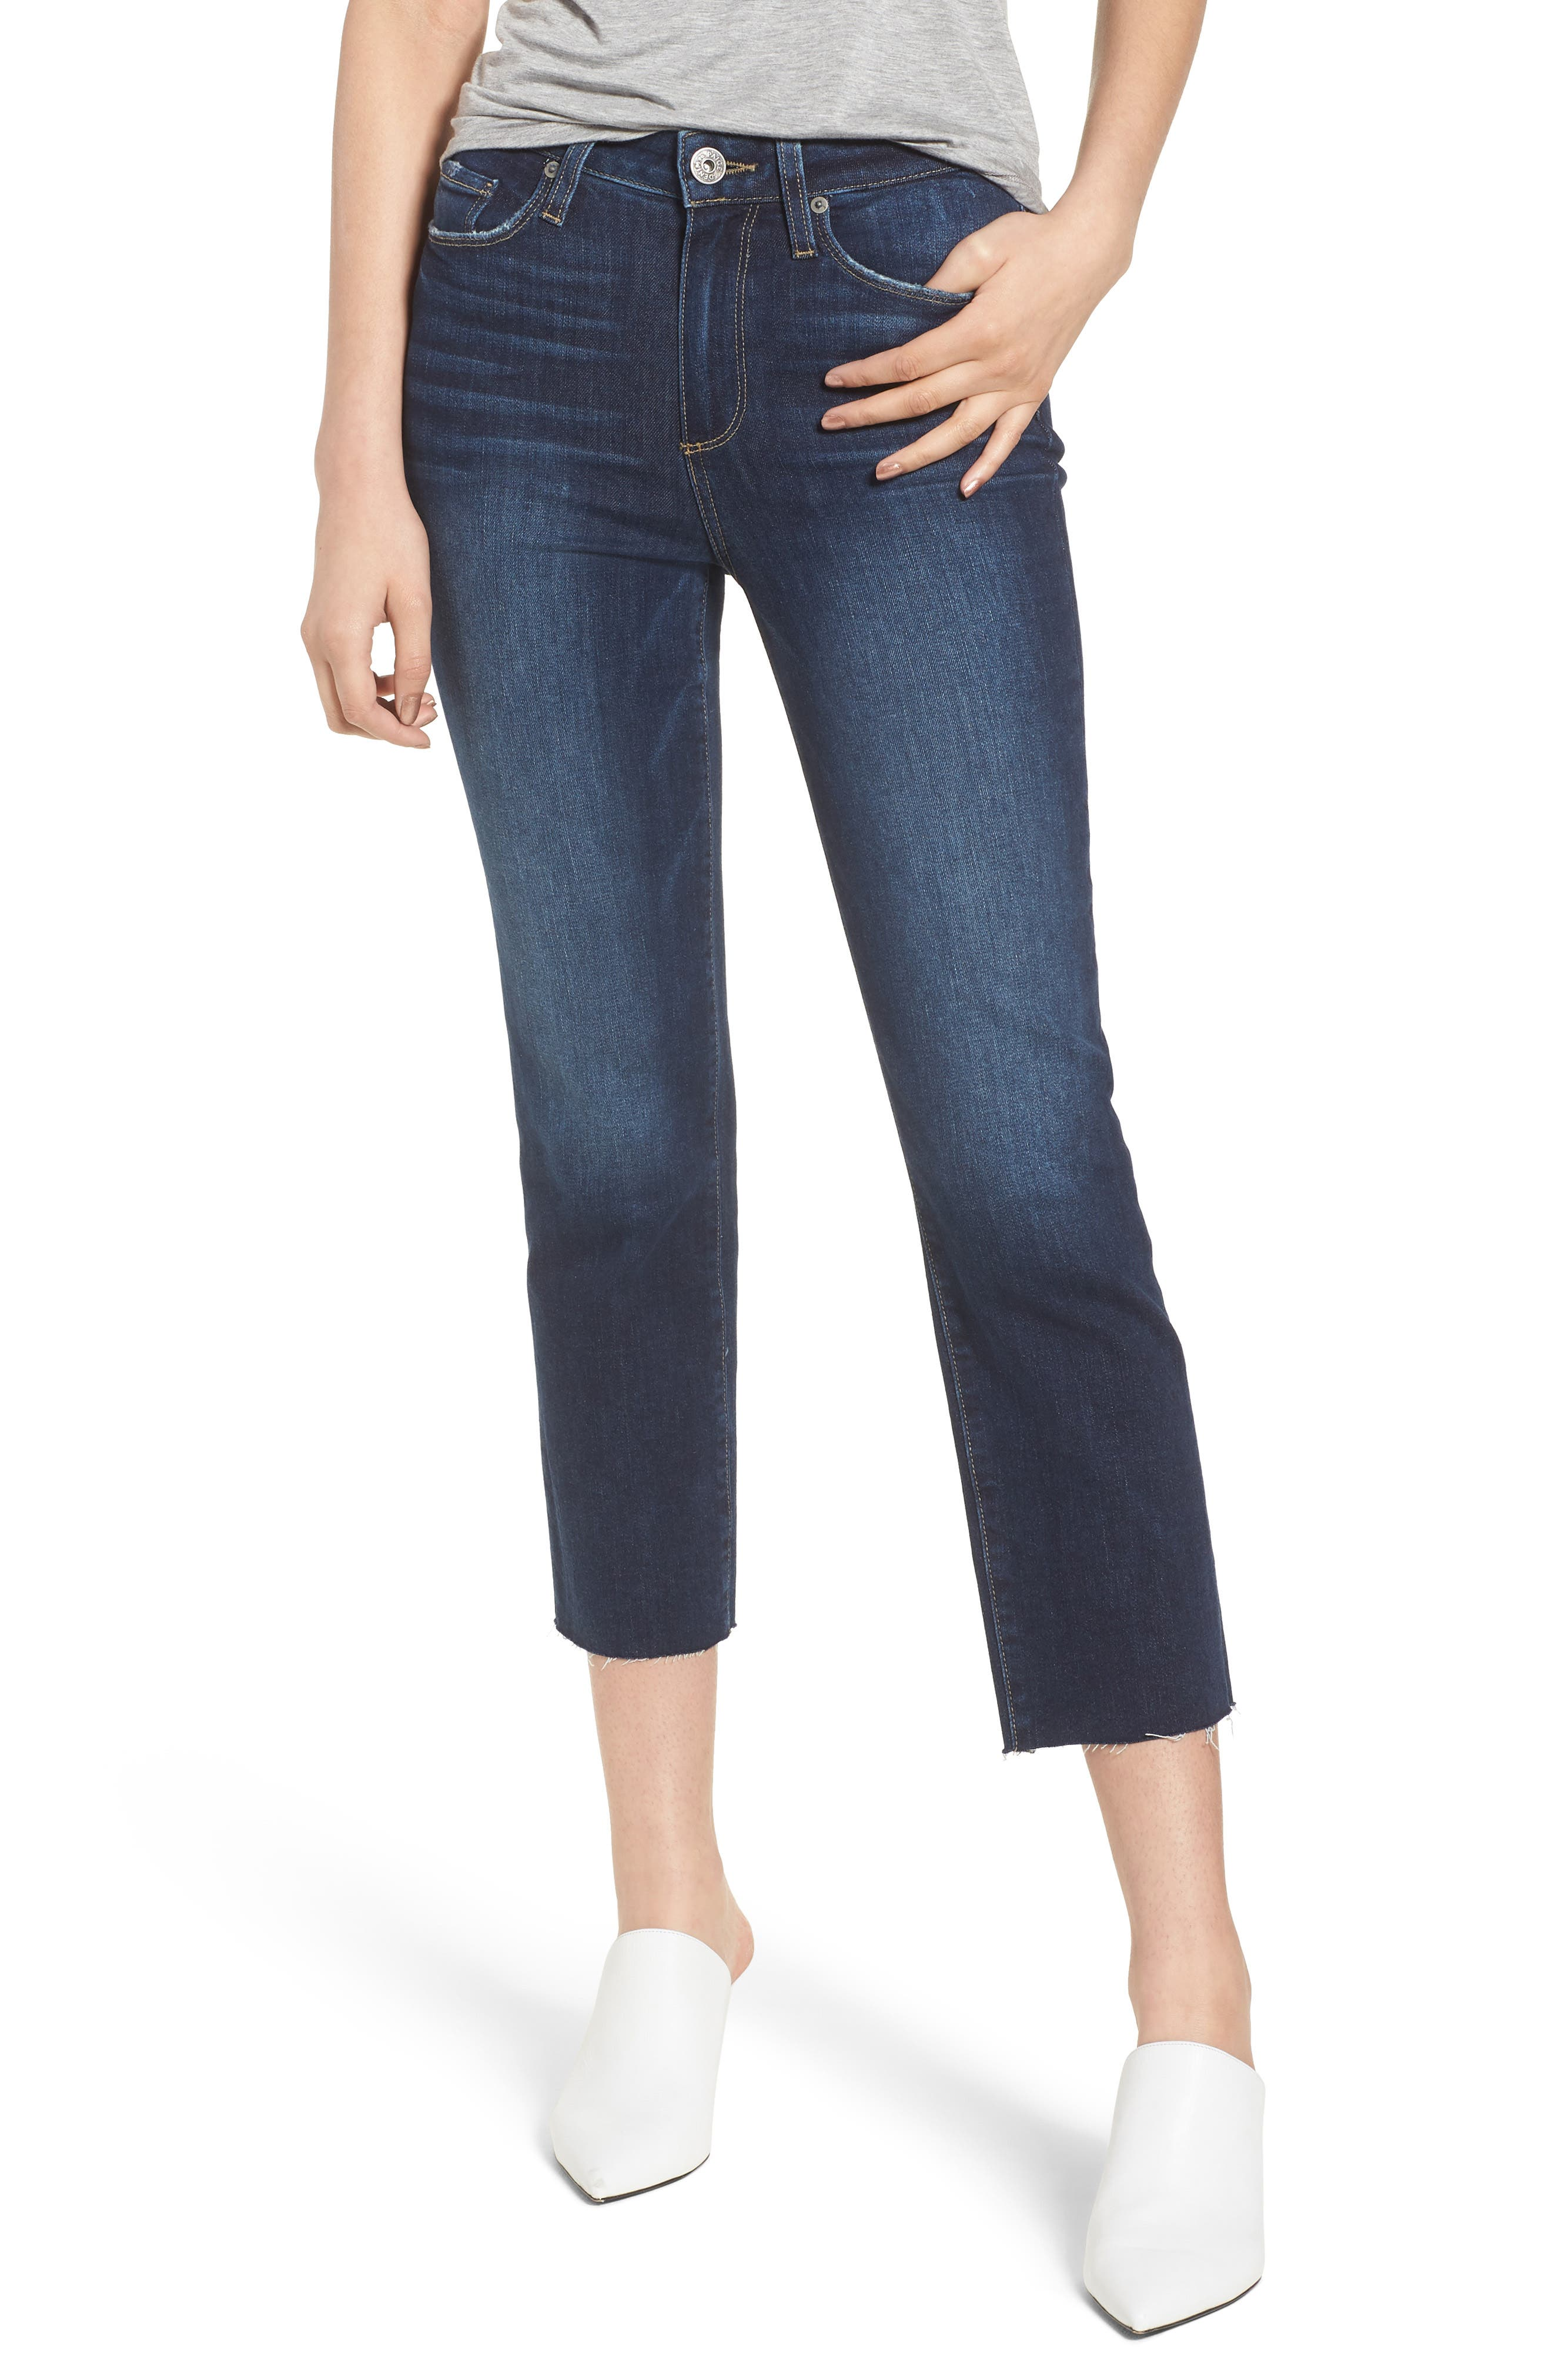 Hoxton Transcend Vintage High Waist Crop Straight Leg Jeans,                             Main thumbnail 1, color,                             400